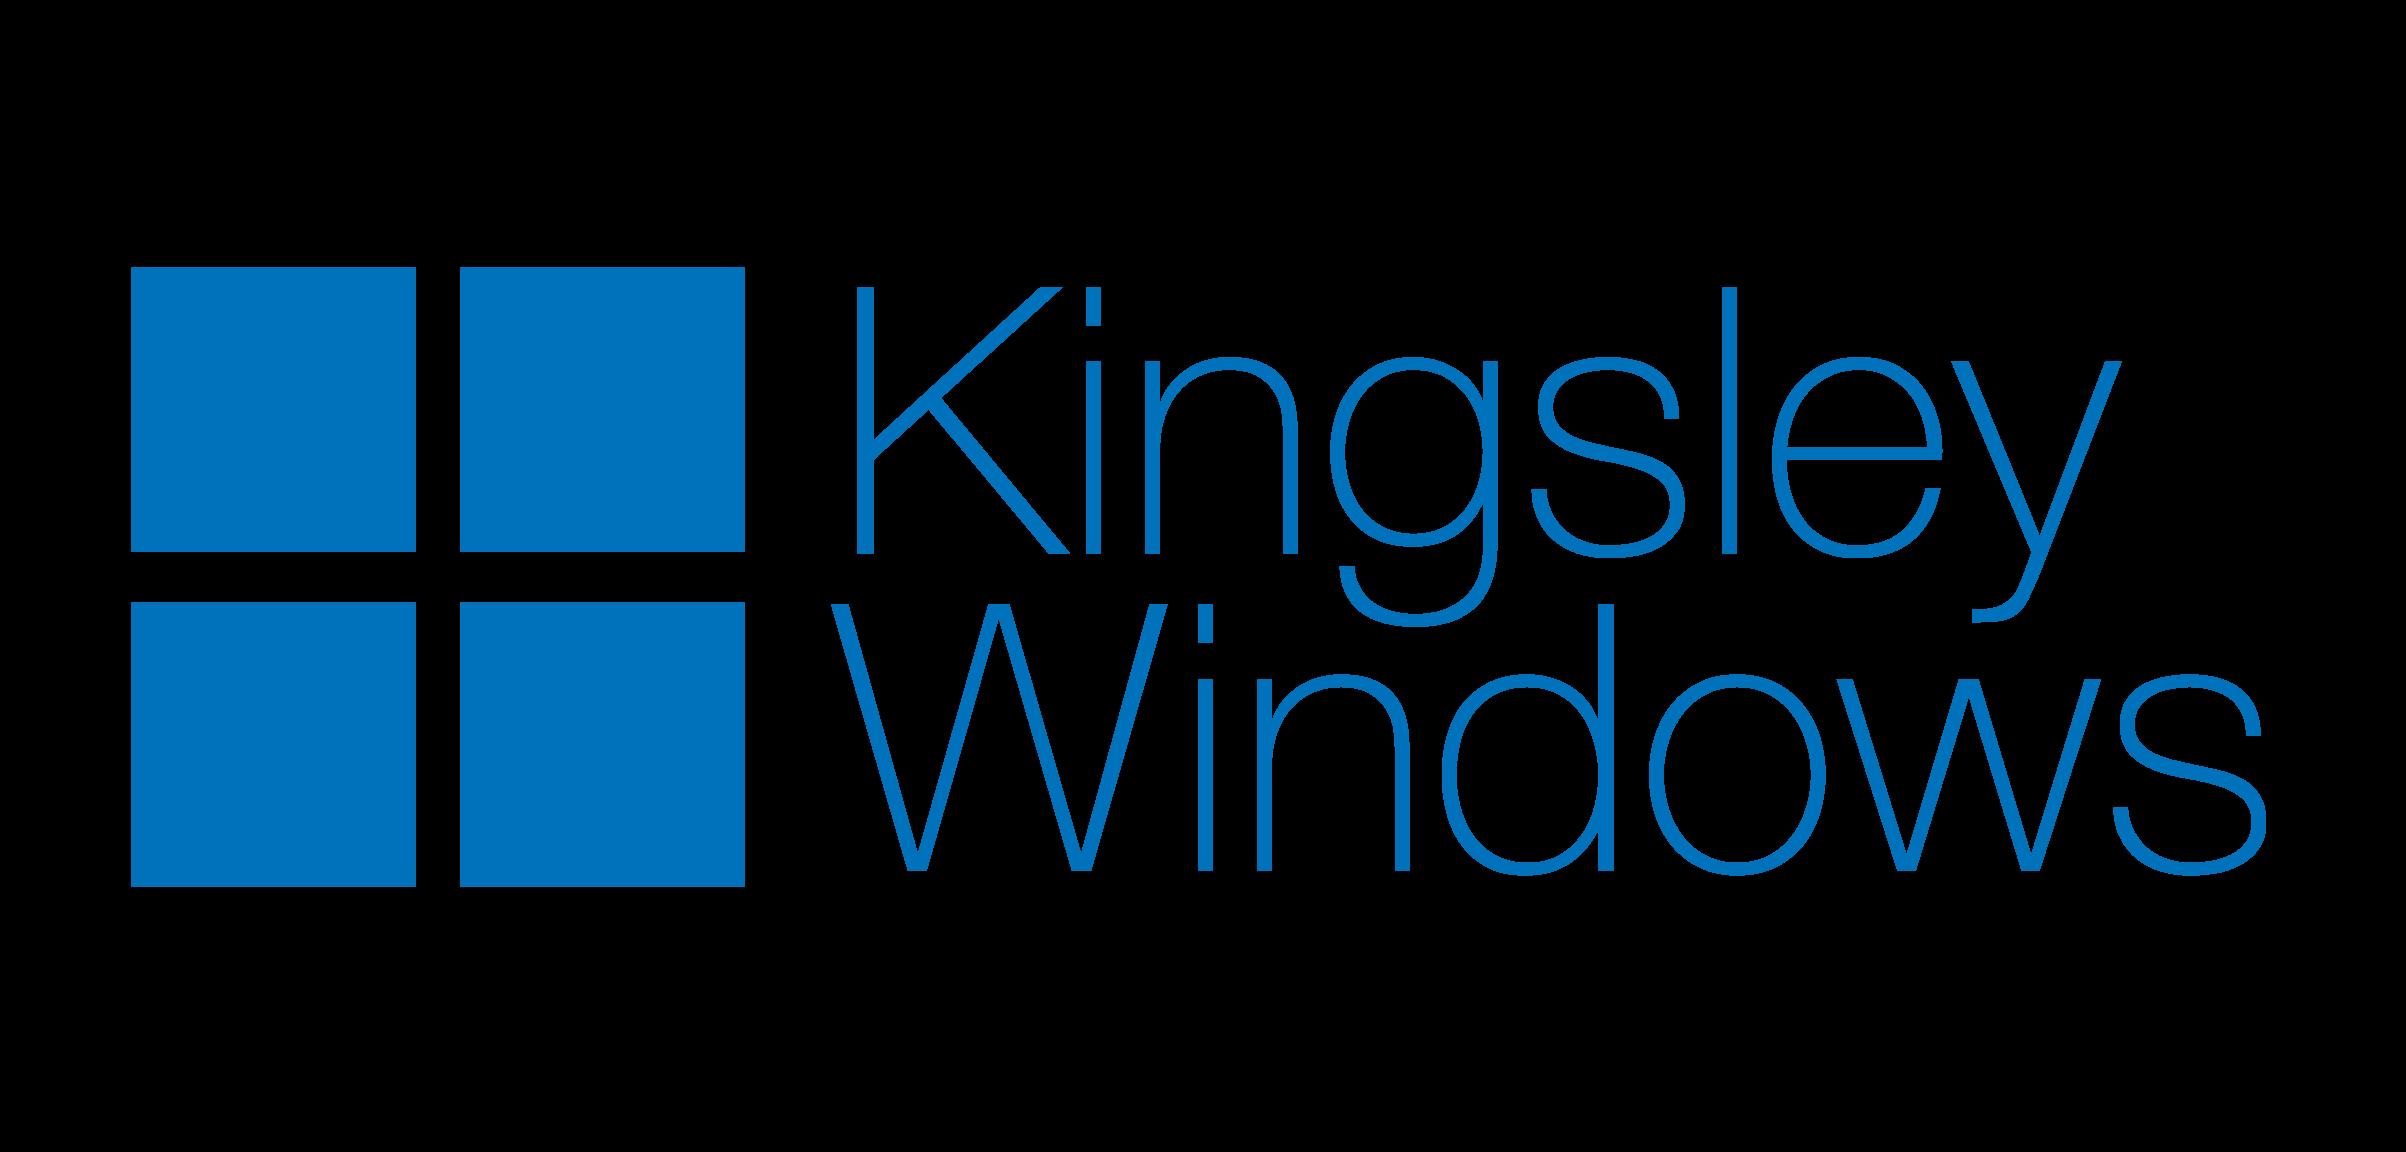 Kingsley Windows